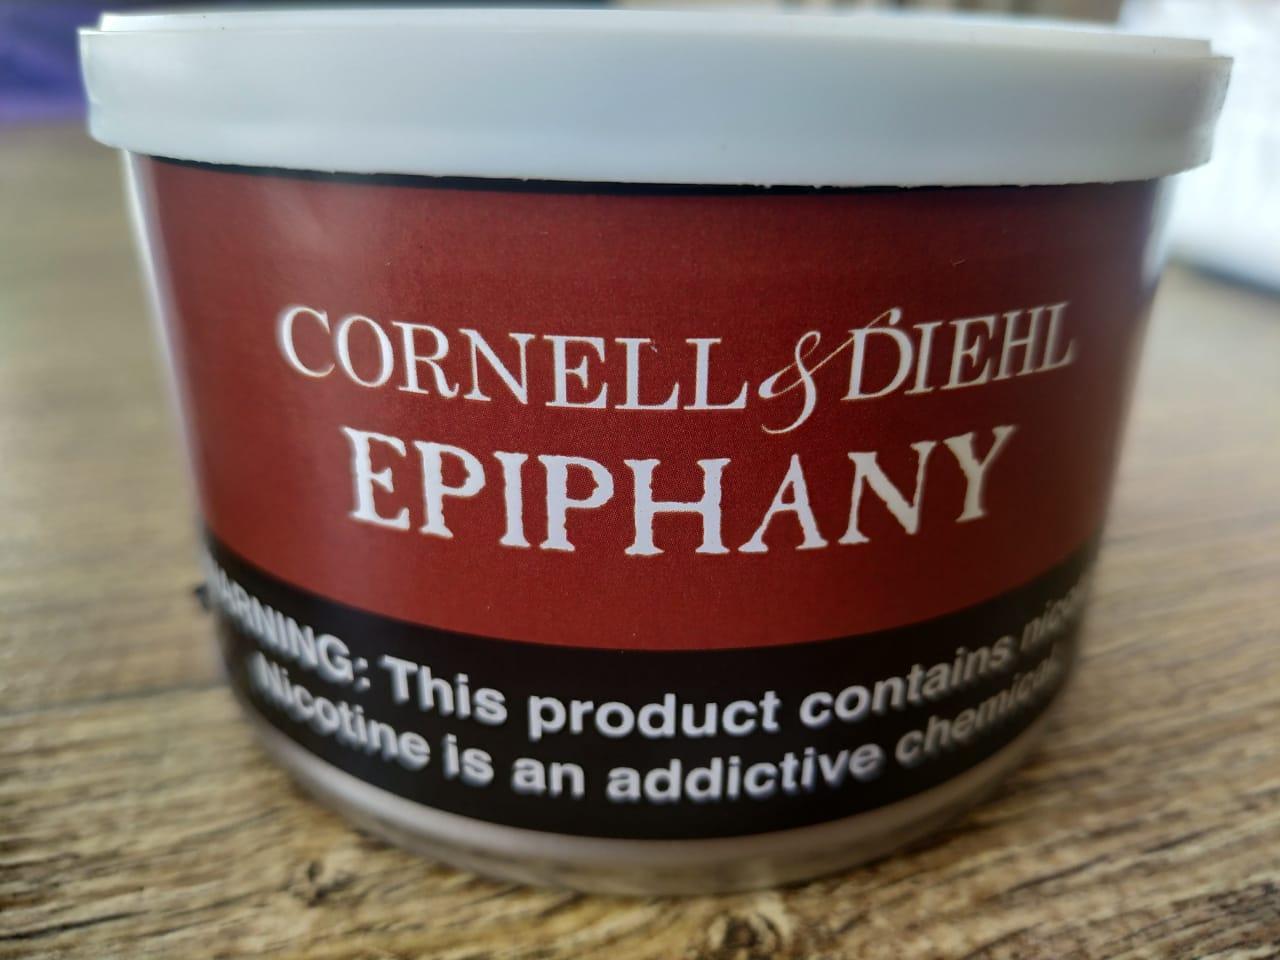 Cornell & Diehl - Epiphany